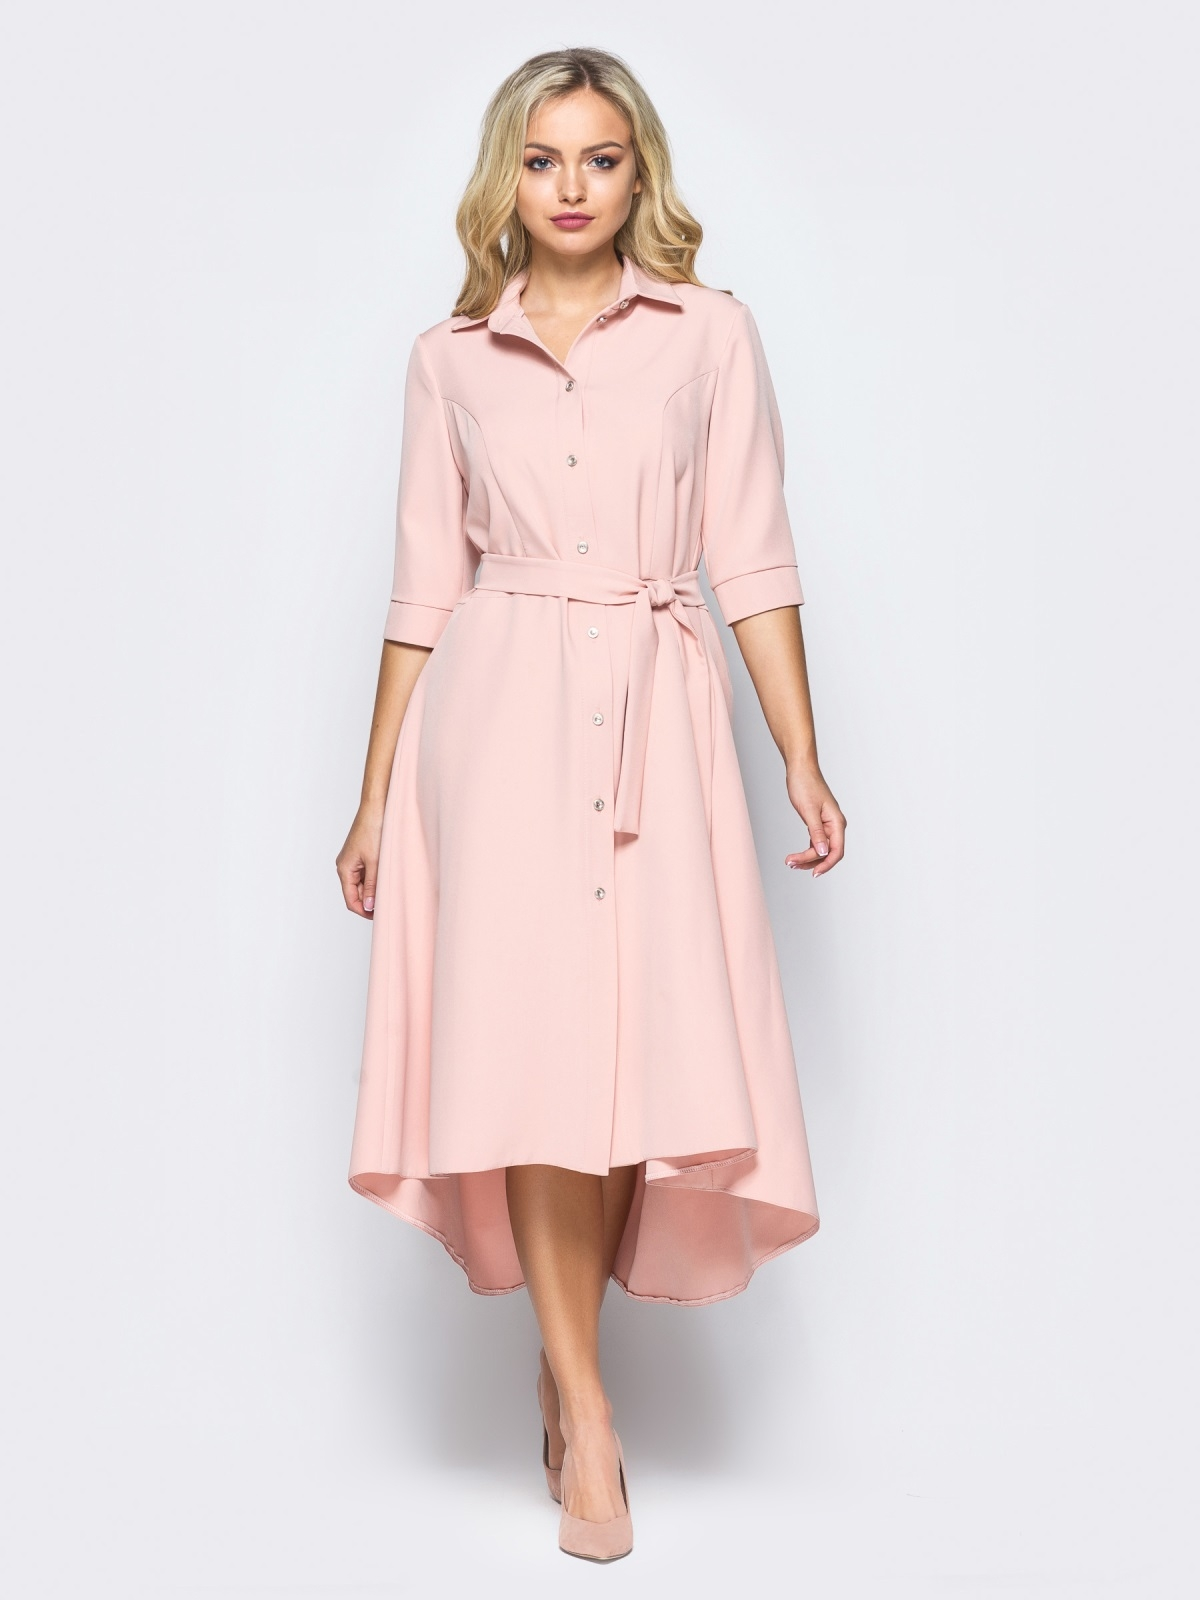 Платье-рубашка розового цвета со шлейфом 16446, фото 1